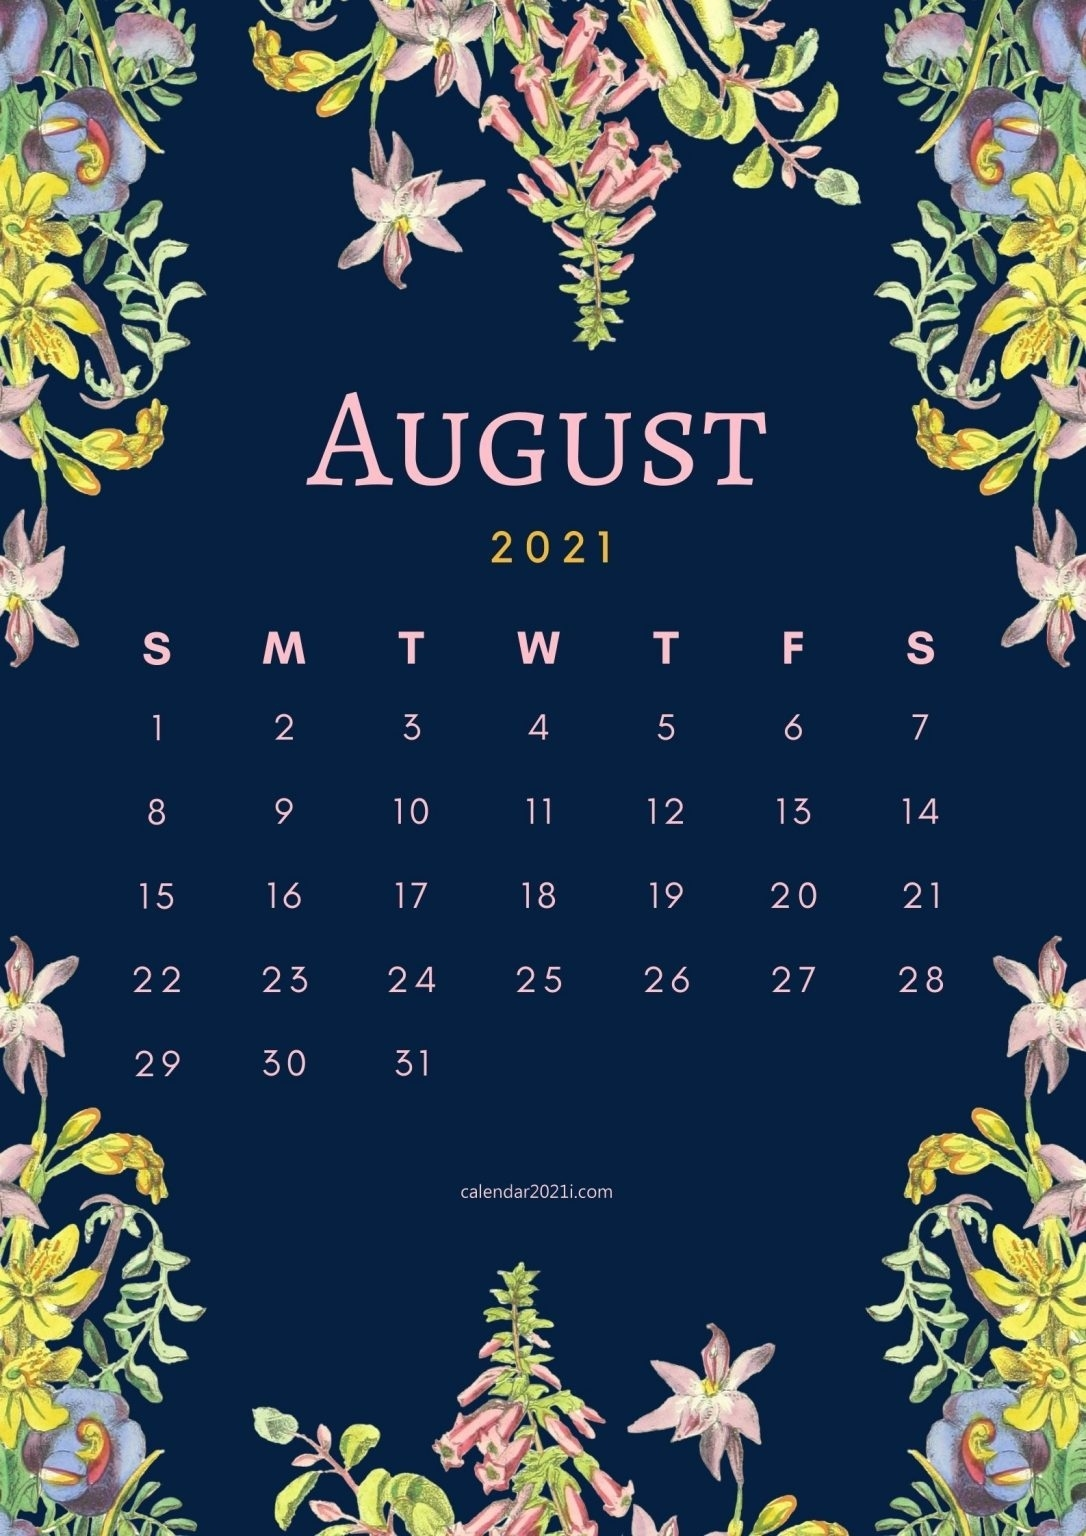 Floral August 2021 Calendar Printable Free Download | Calendar 2021 August 2021 Calendar Floral